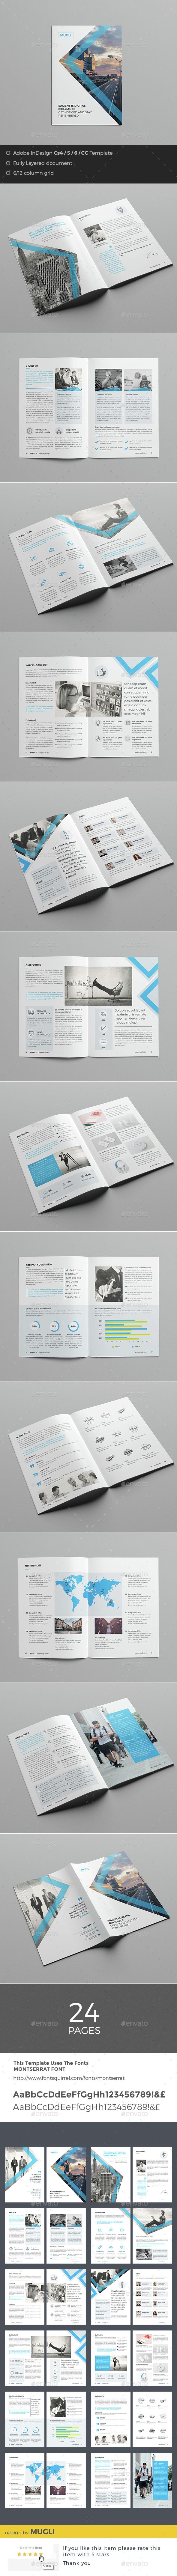 Business Brochure Template InDesign INDD. Download here: http://graphicriver.net/item/business-brochure/14734303?ref=ksioks